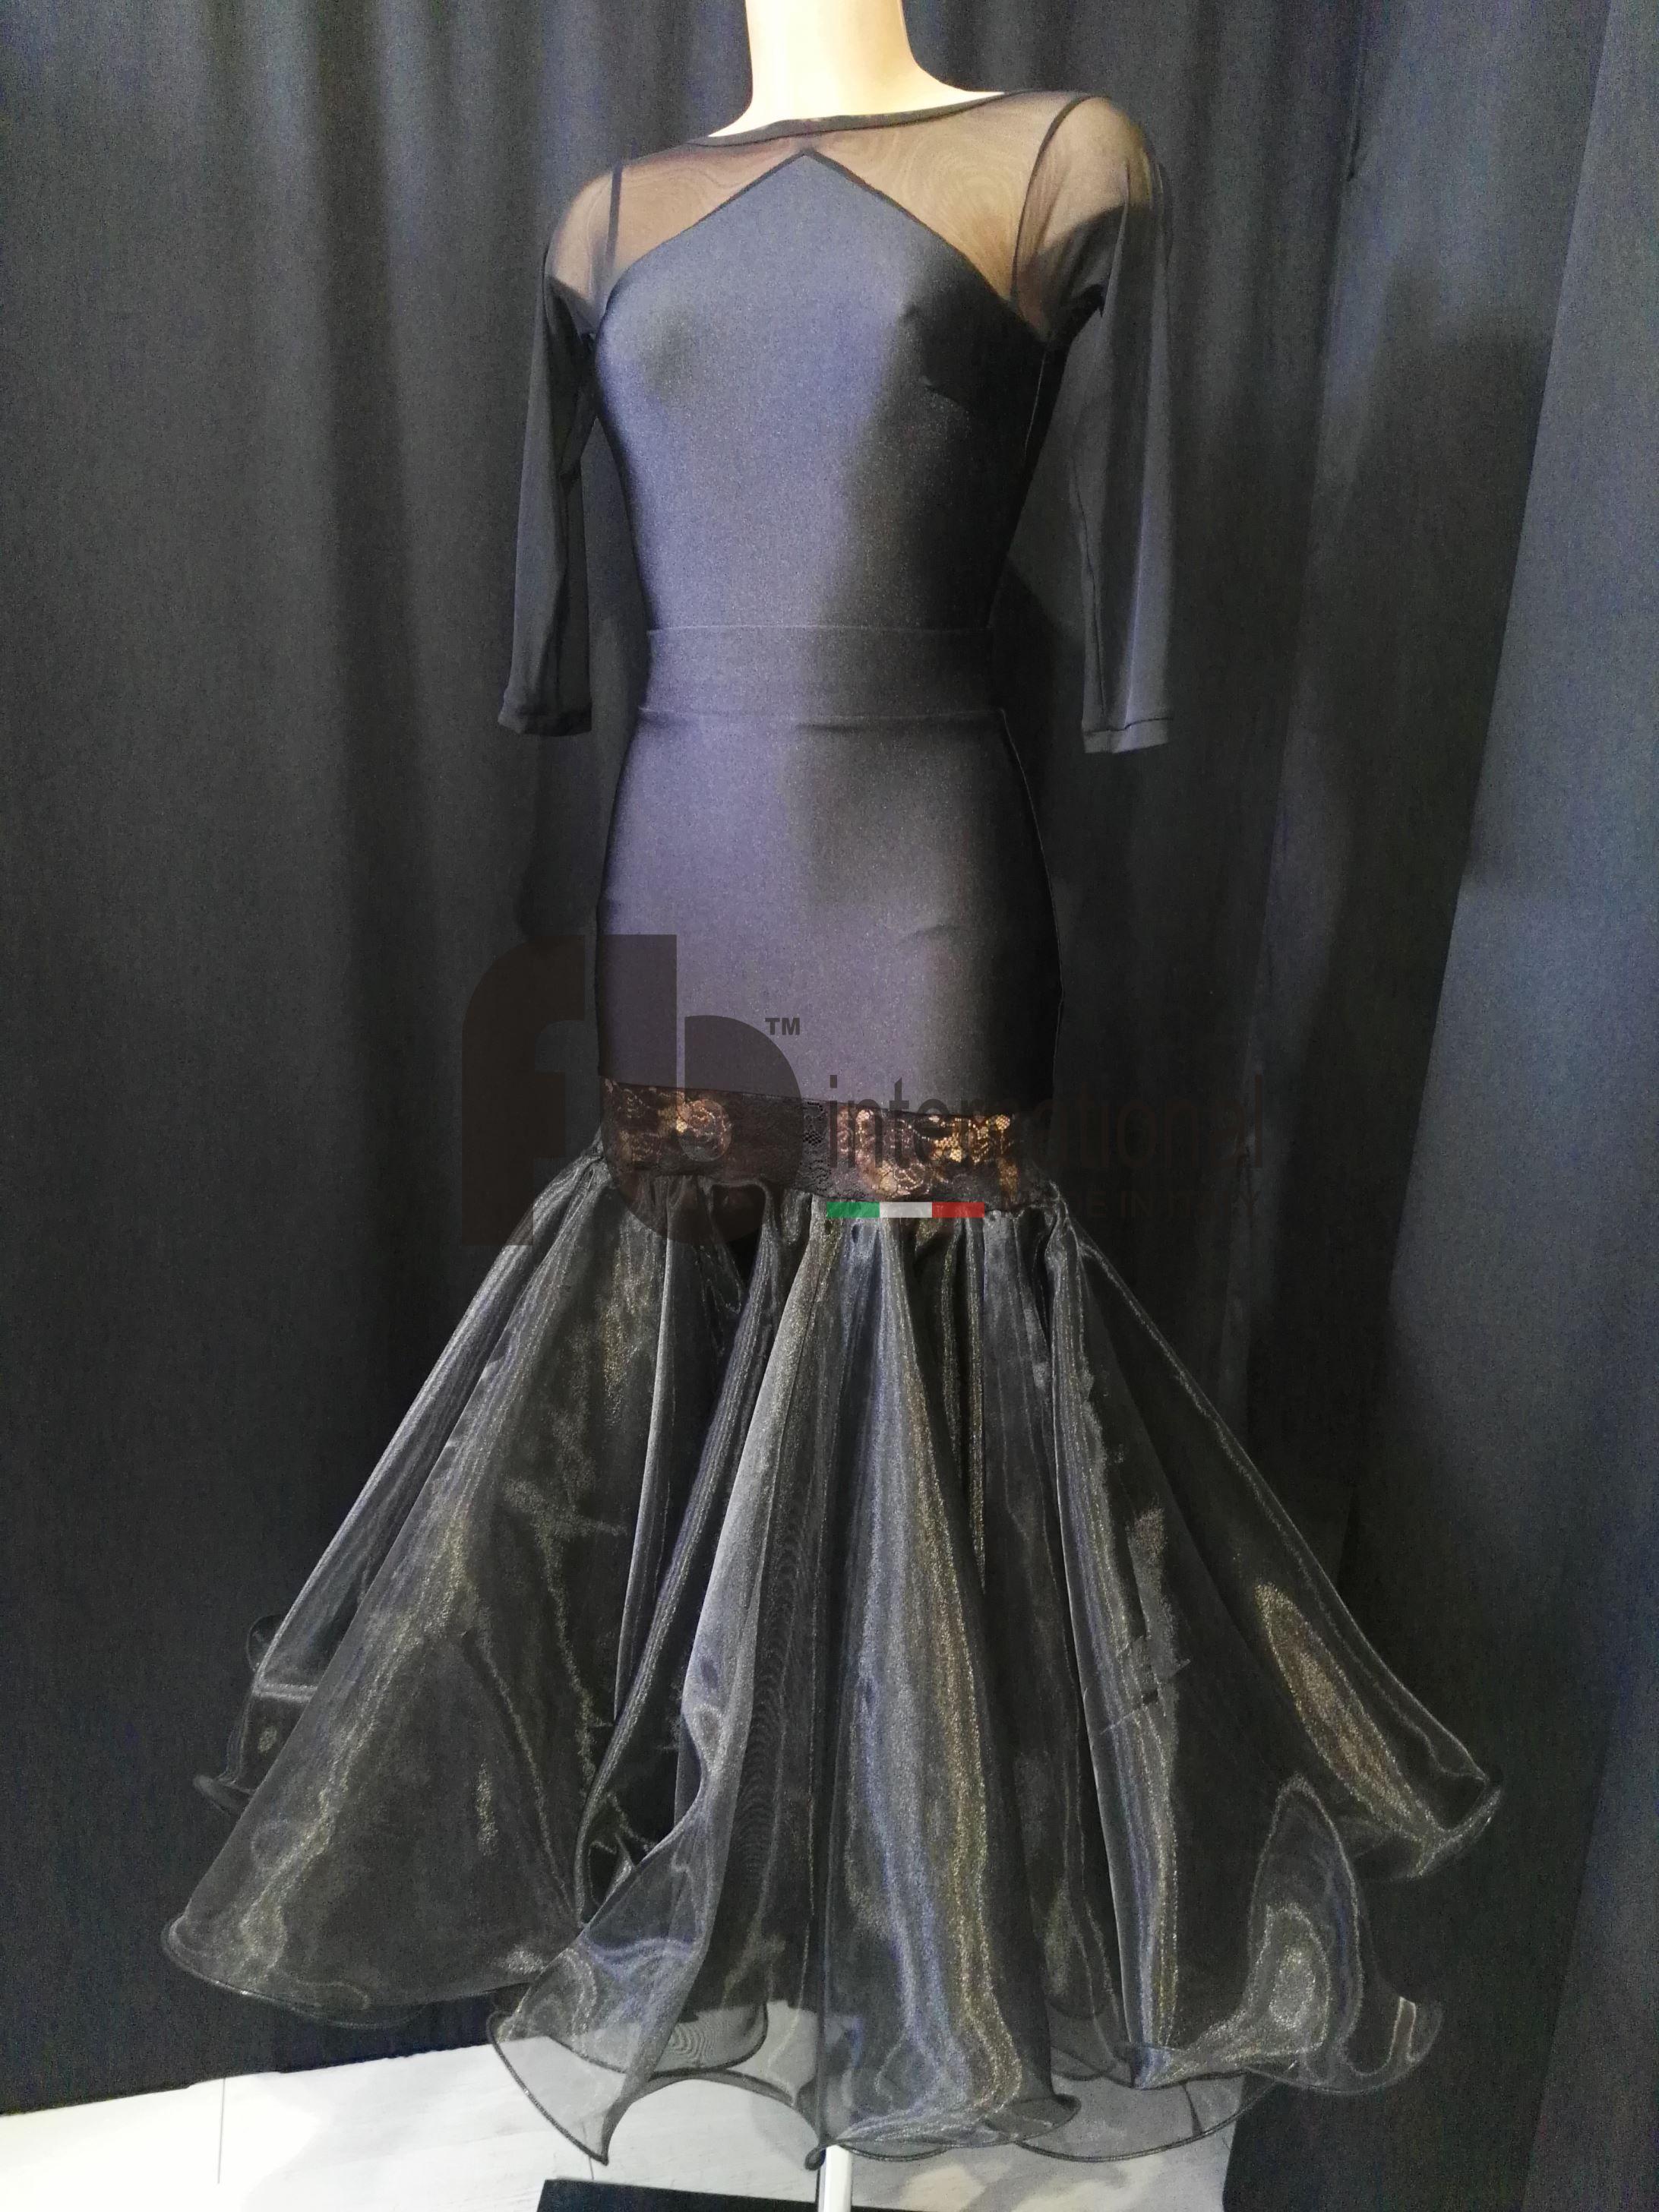 Topazio skirt